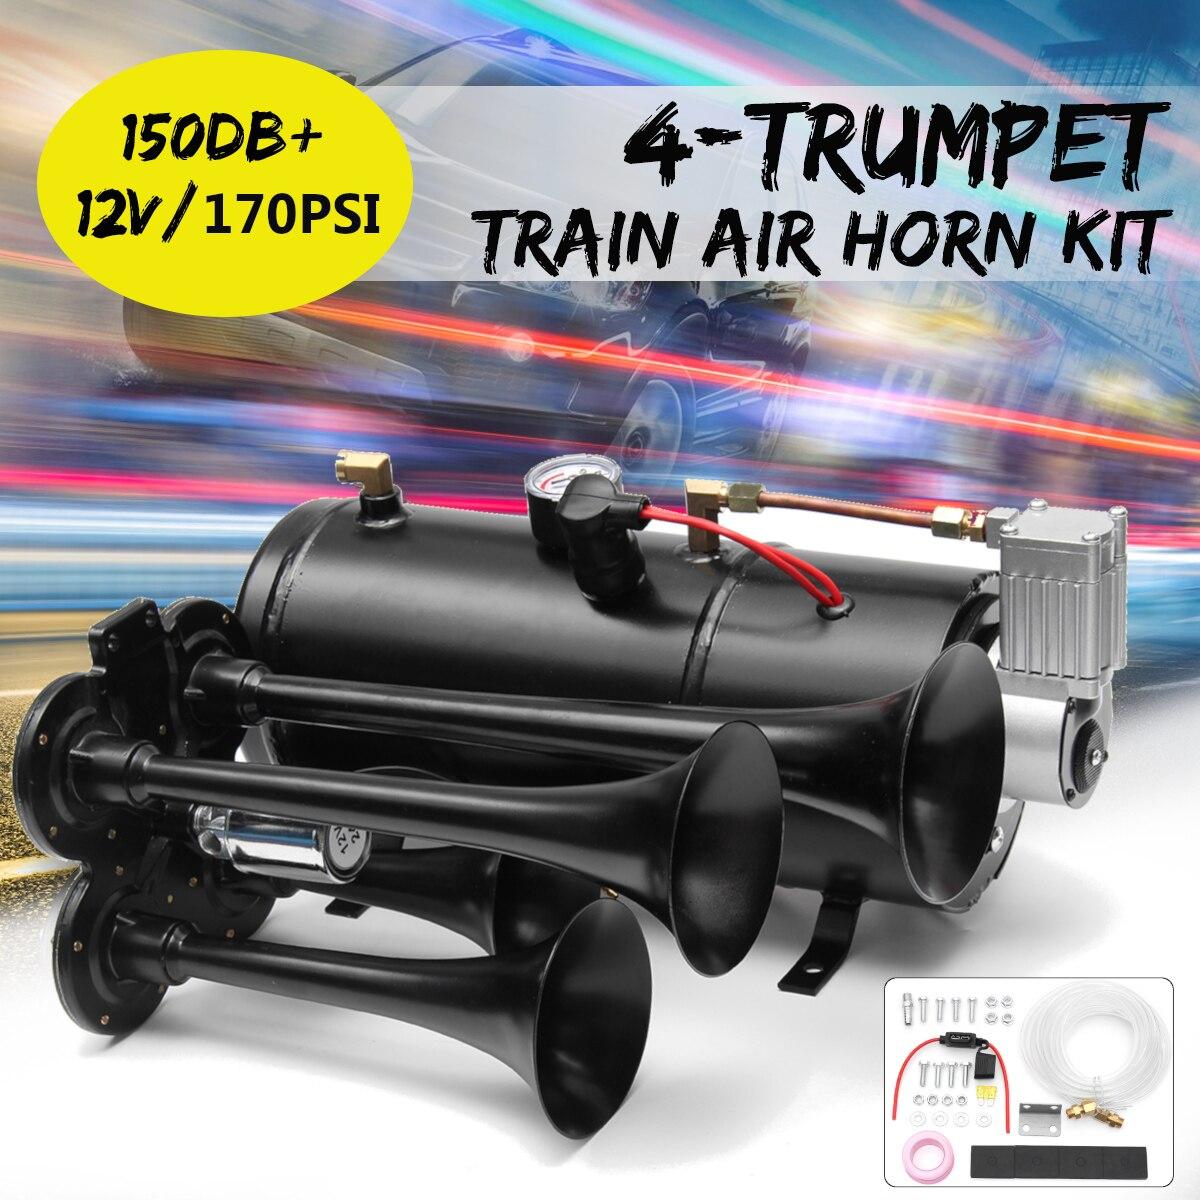 with 120 PSI 12V Compressor and Gauge 150DB Super Loud Train Horns kit for Trucks Black 4 Air Horn Trumpet for Car Truck Train Van Boat